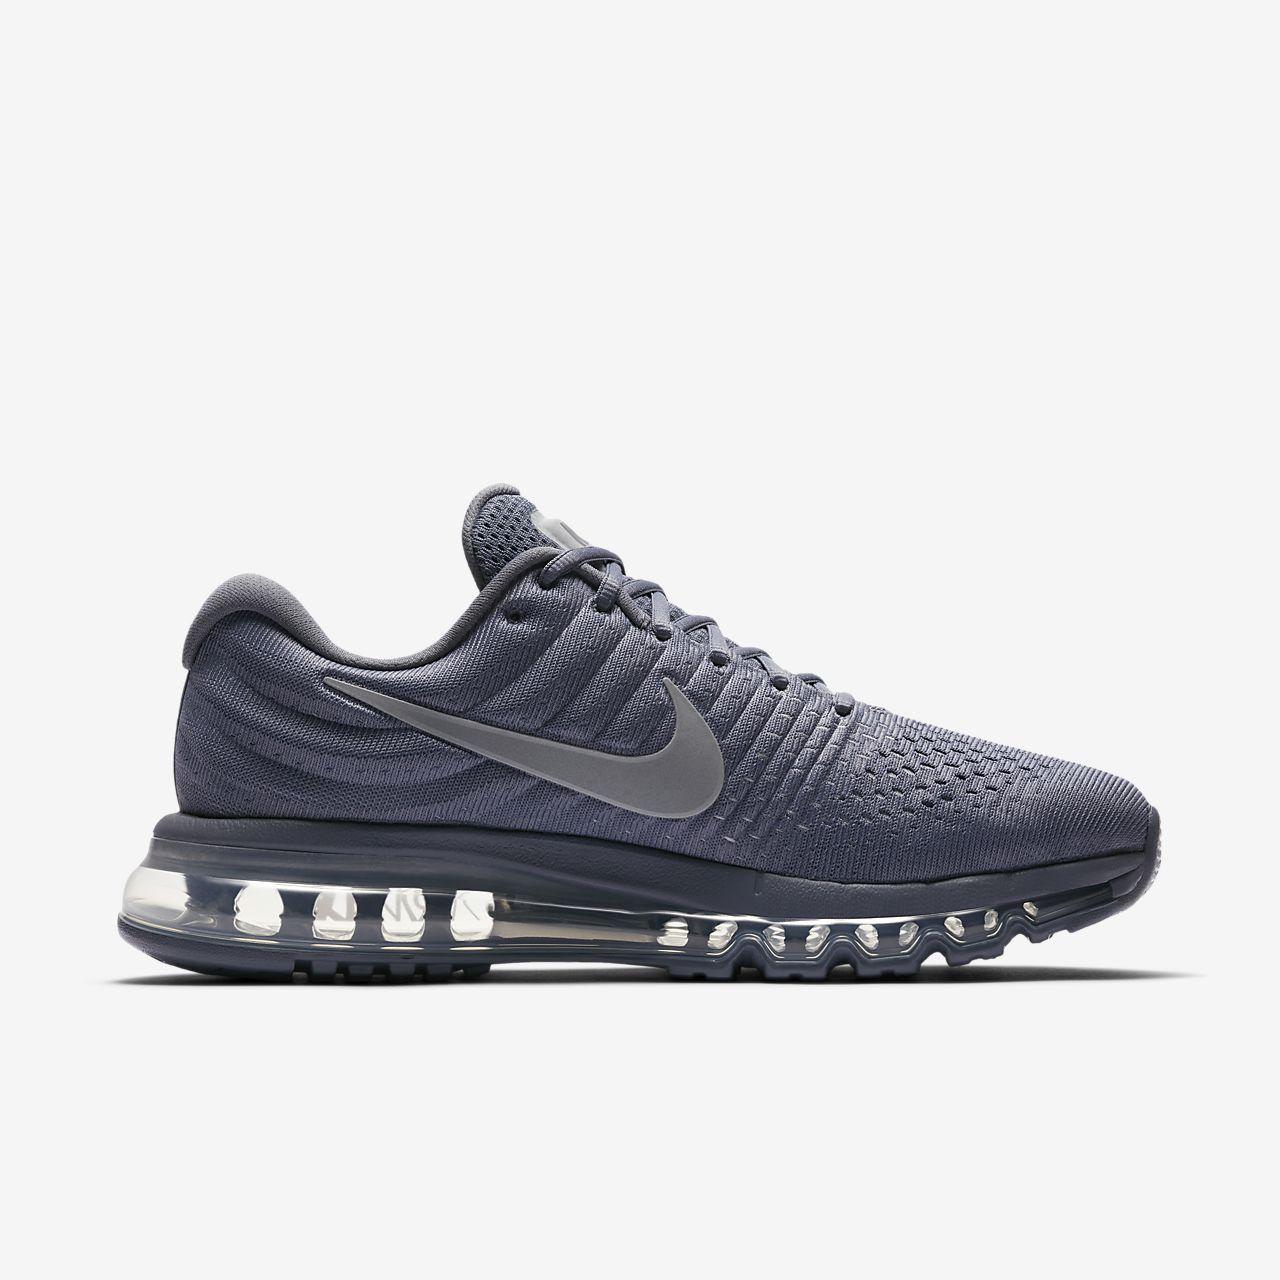 scarpa da running nike air max 2017 se light carbonwolf